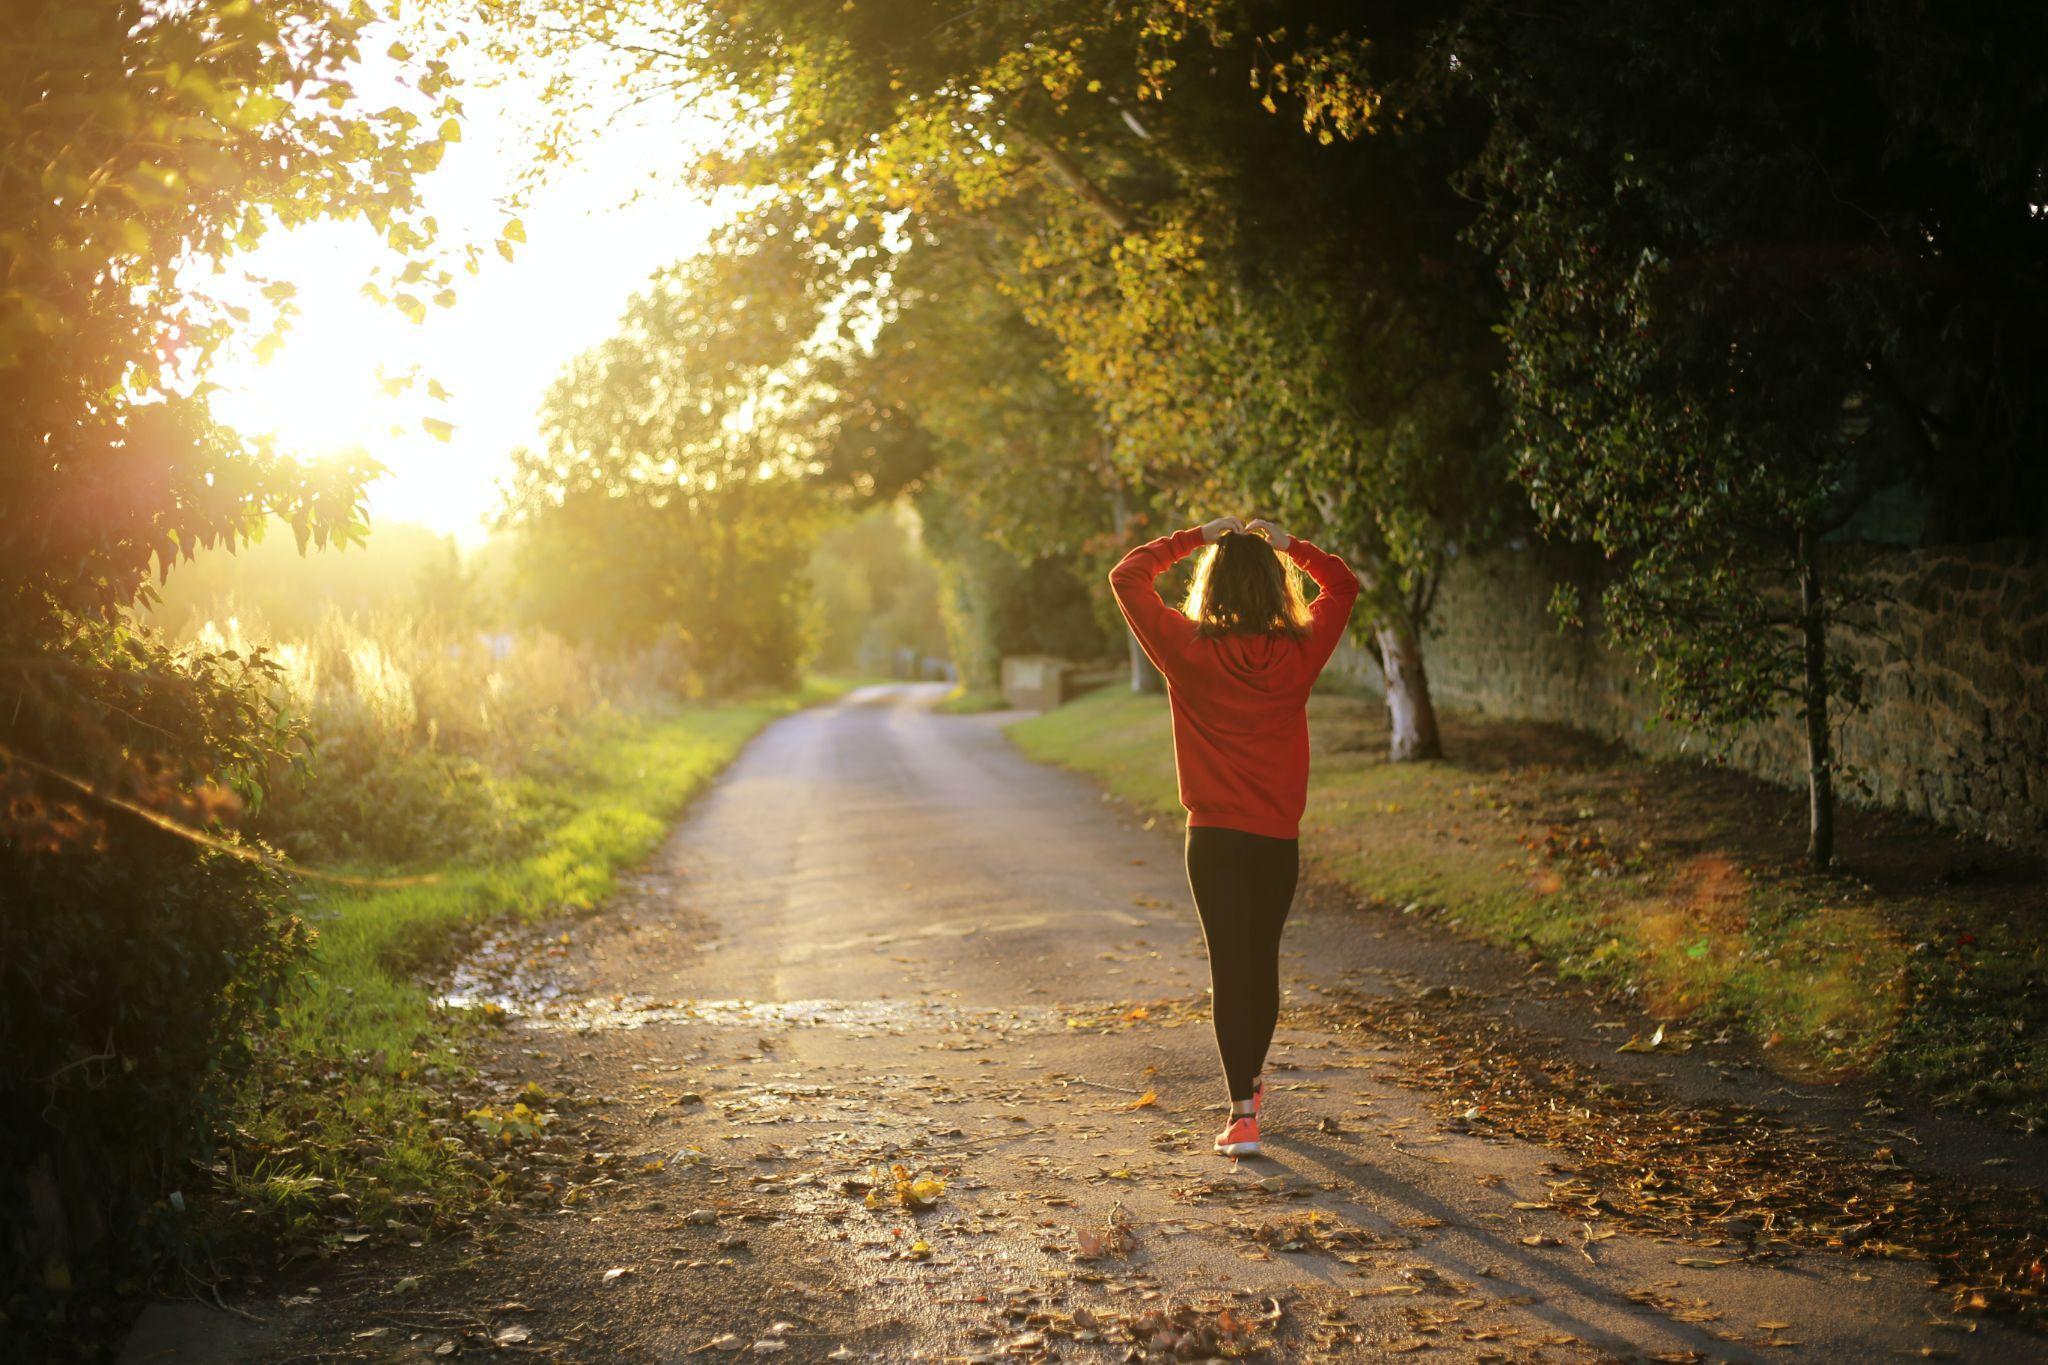 Habits that Build Mental Fortitude